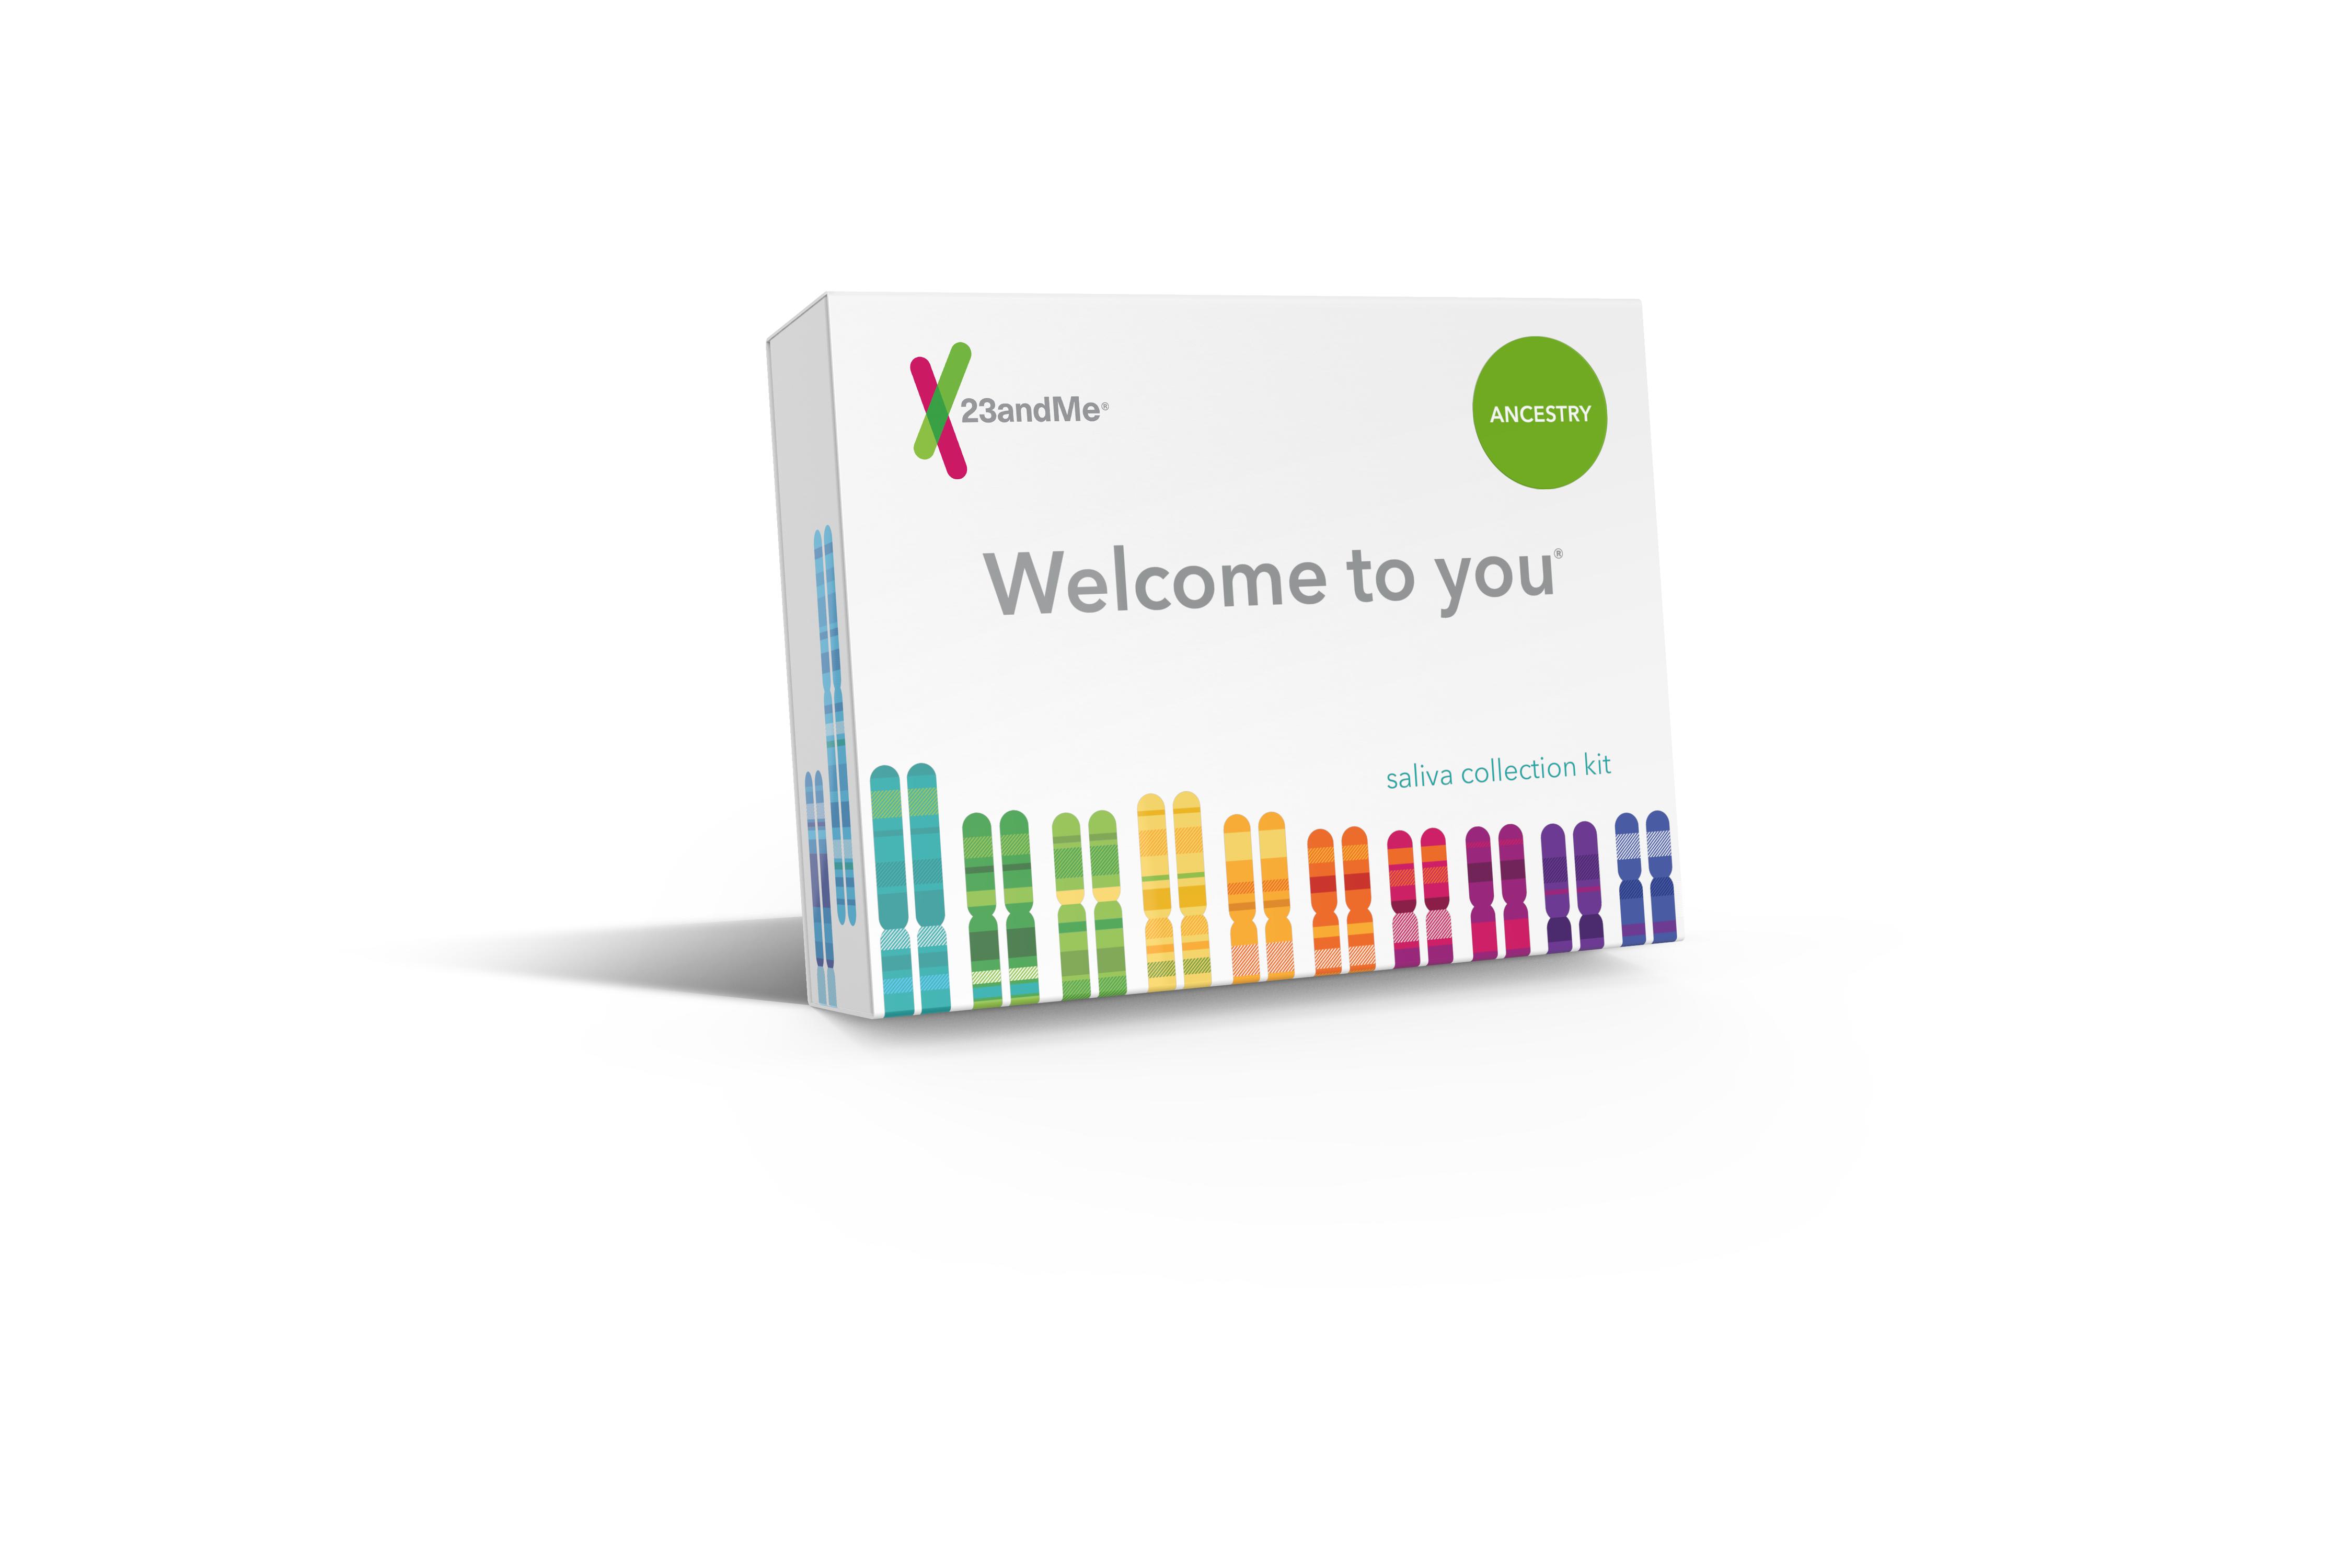 cancer genetic testing companies